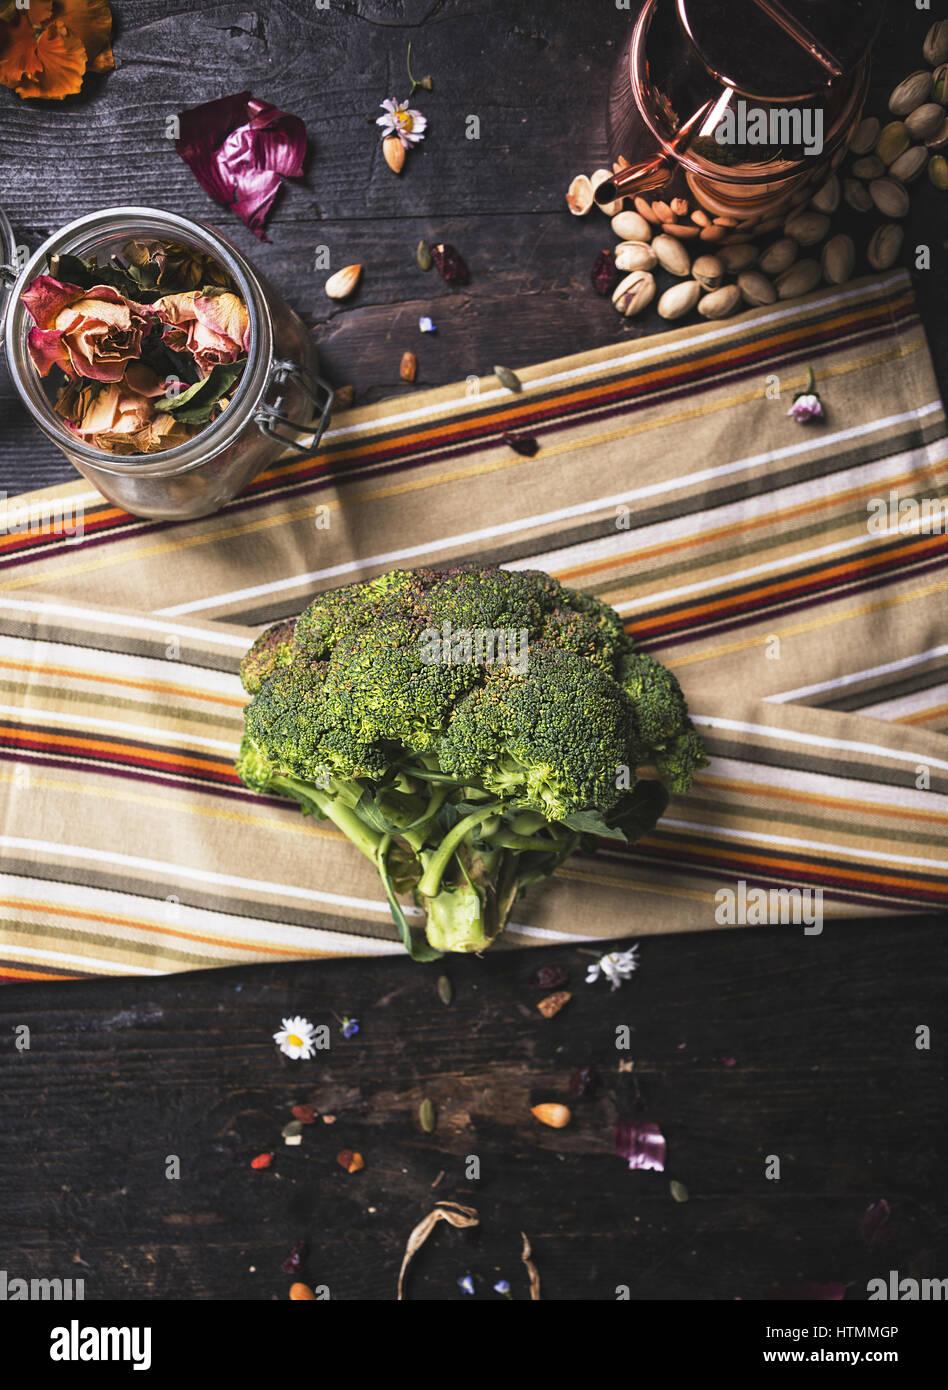 Raw broccoli on dark wooden table Stock Photo